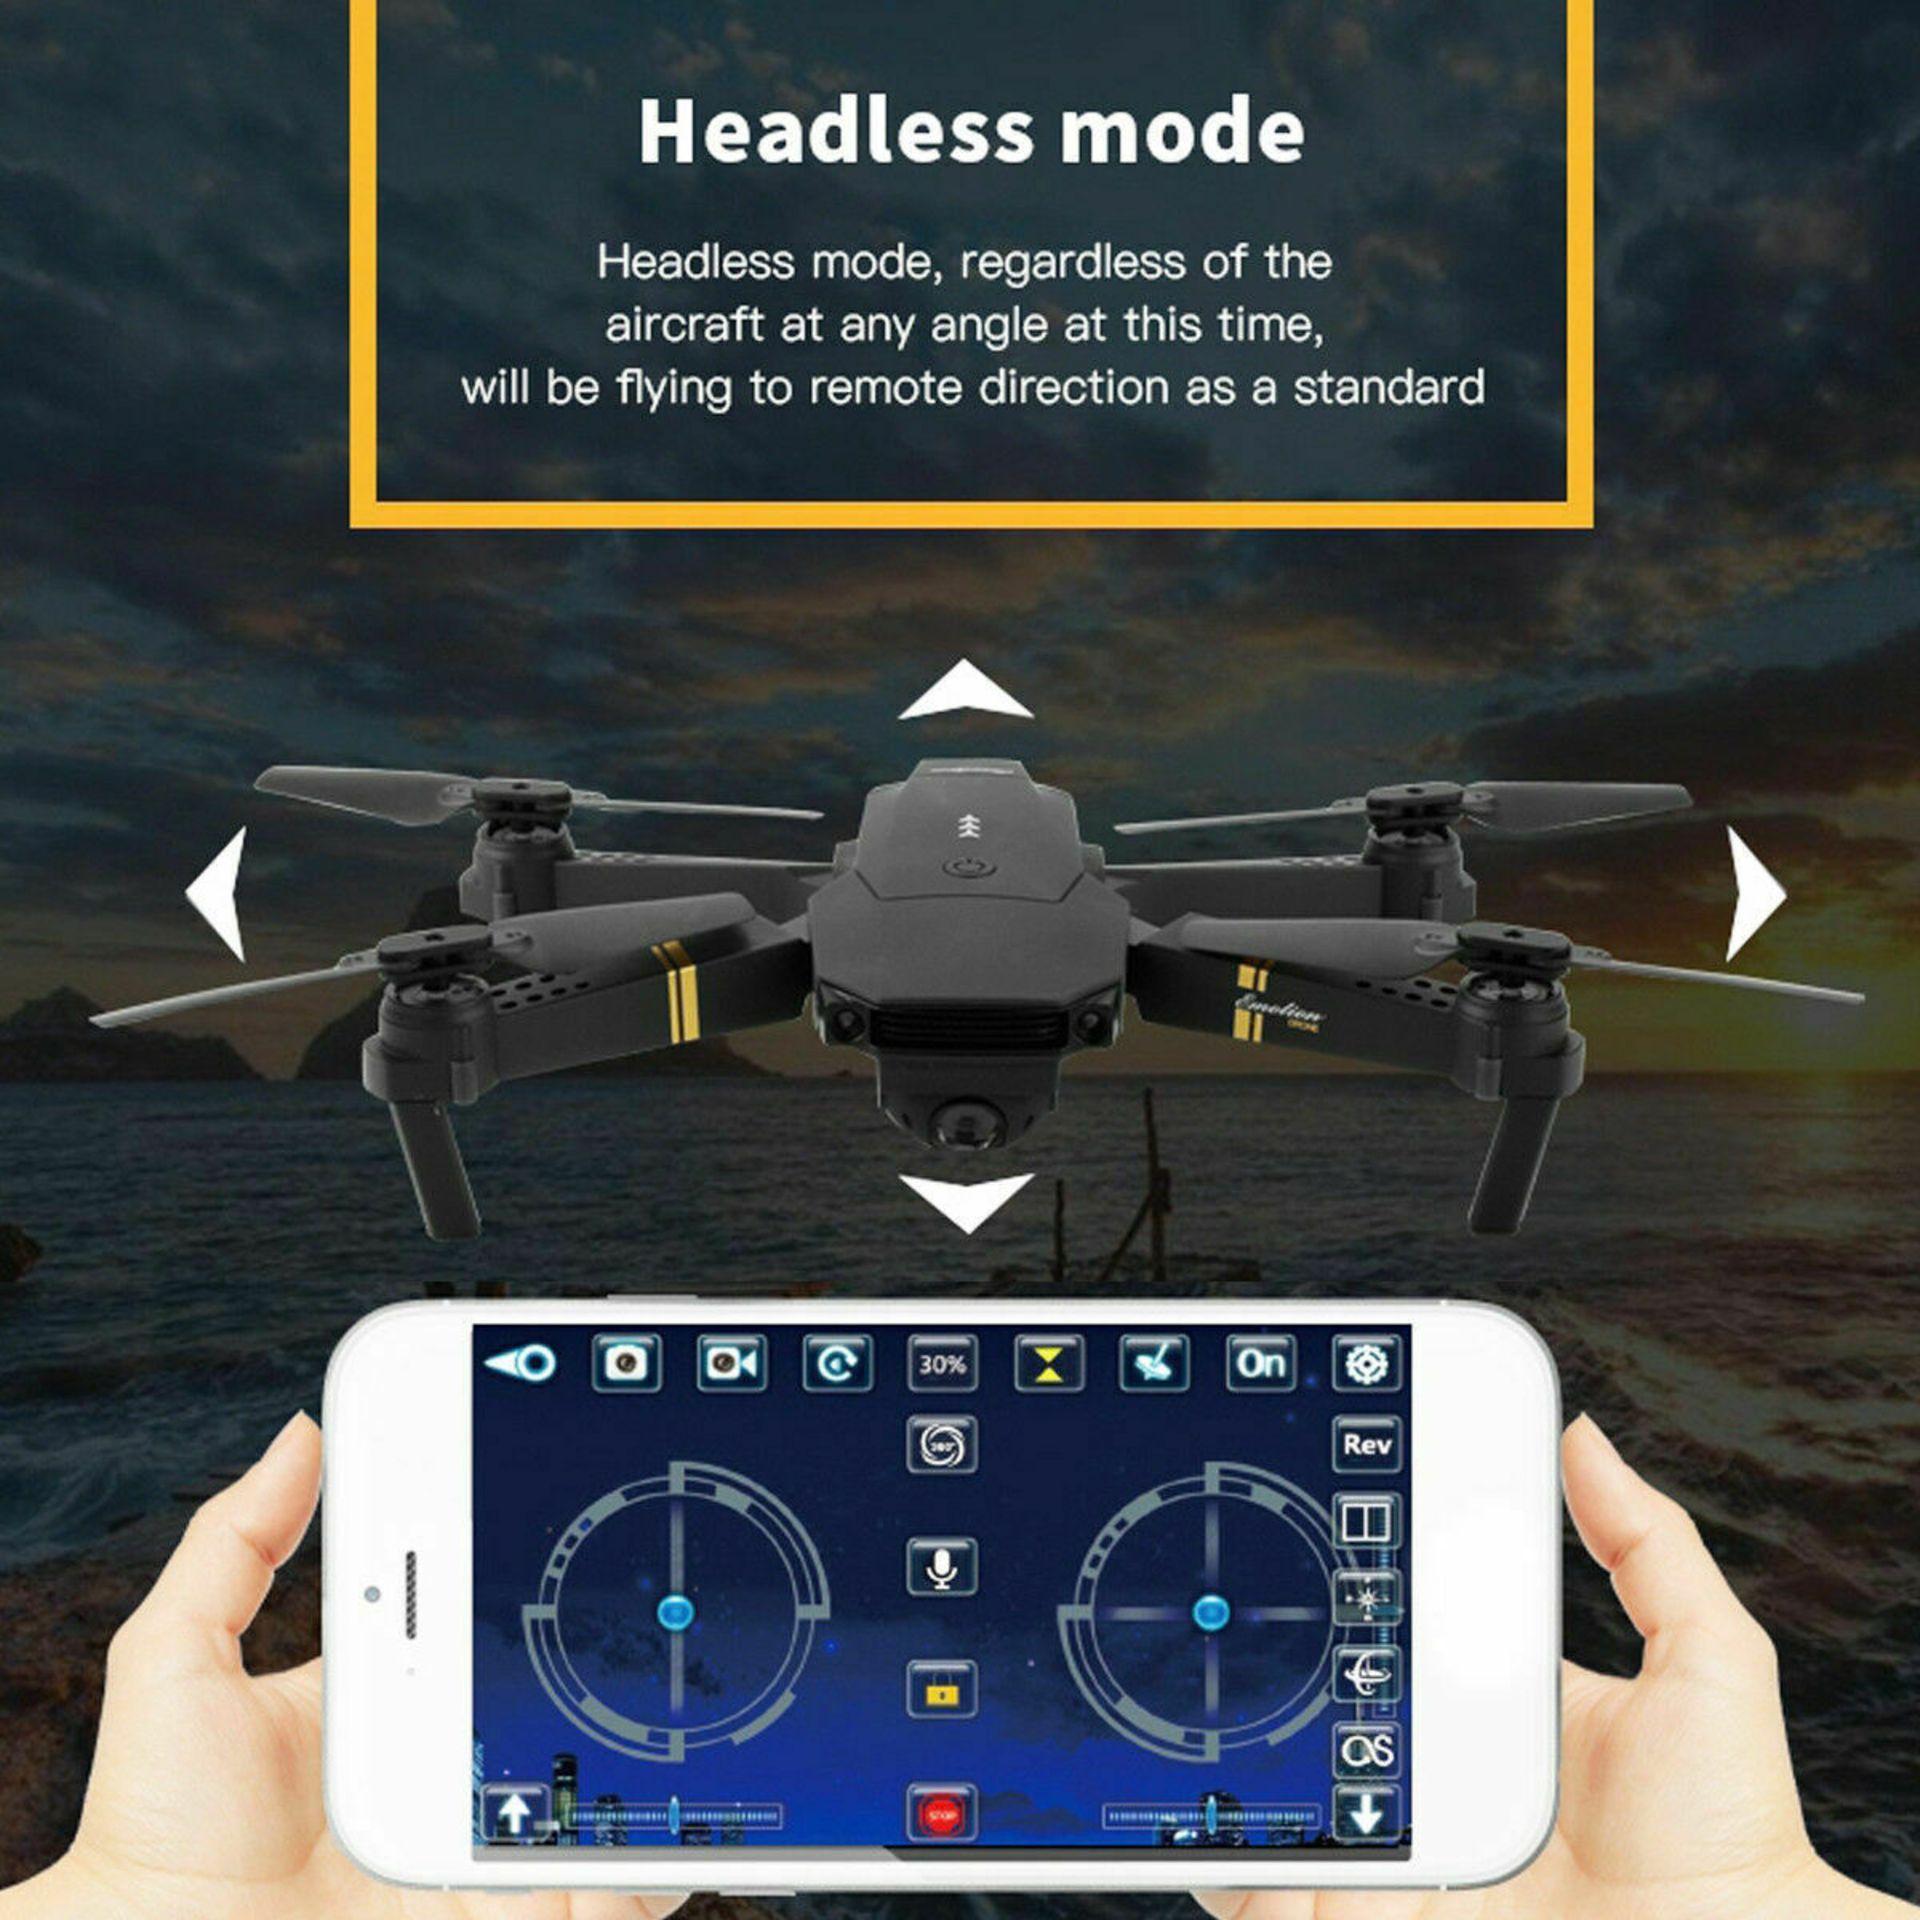 NEW & UNUSED DRONE X PRO WIFI FPV 1080P HD CAMERA FOLDABLE RC QUADCOPTER + BAG *PLUS VAT* - Image 11 of 12